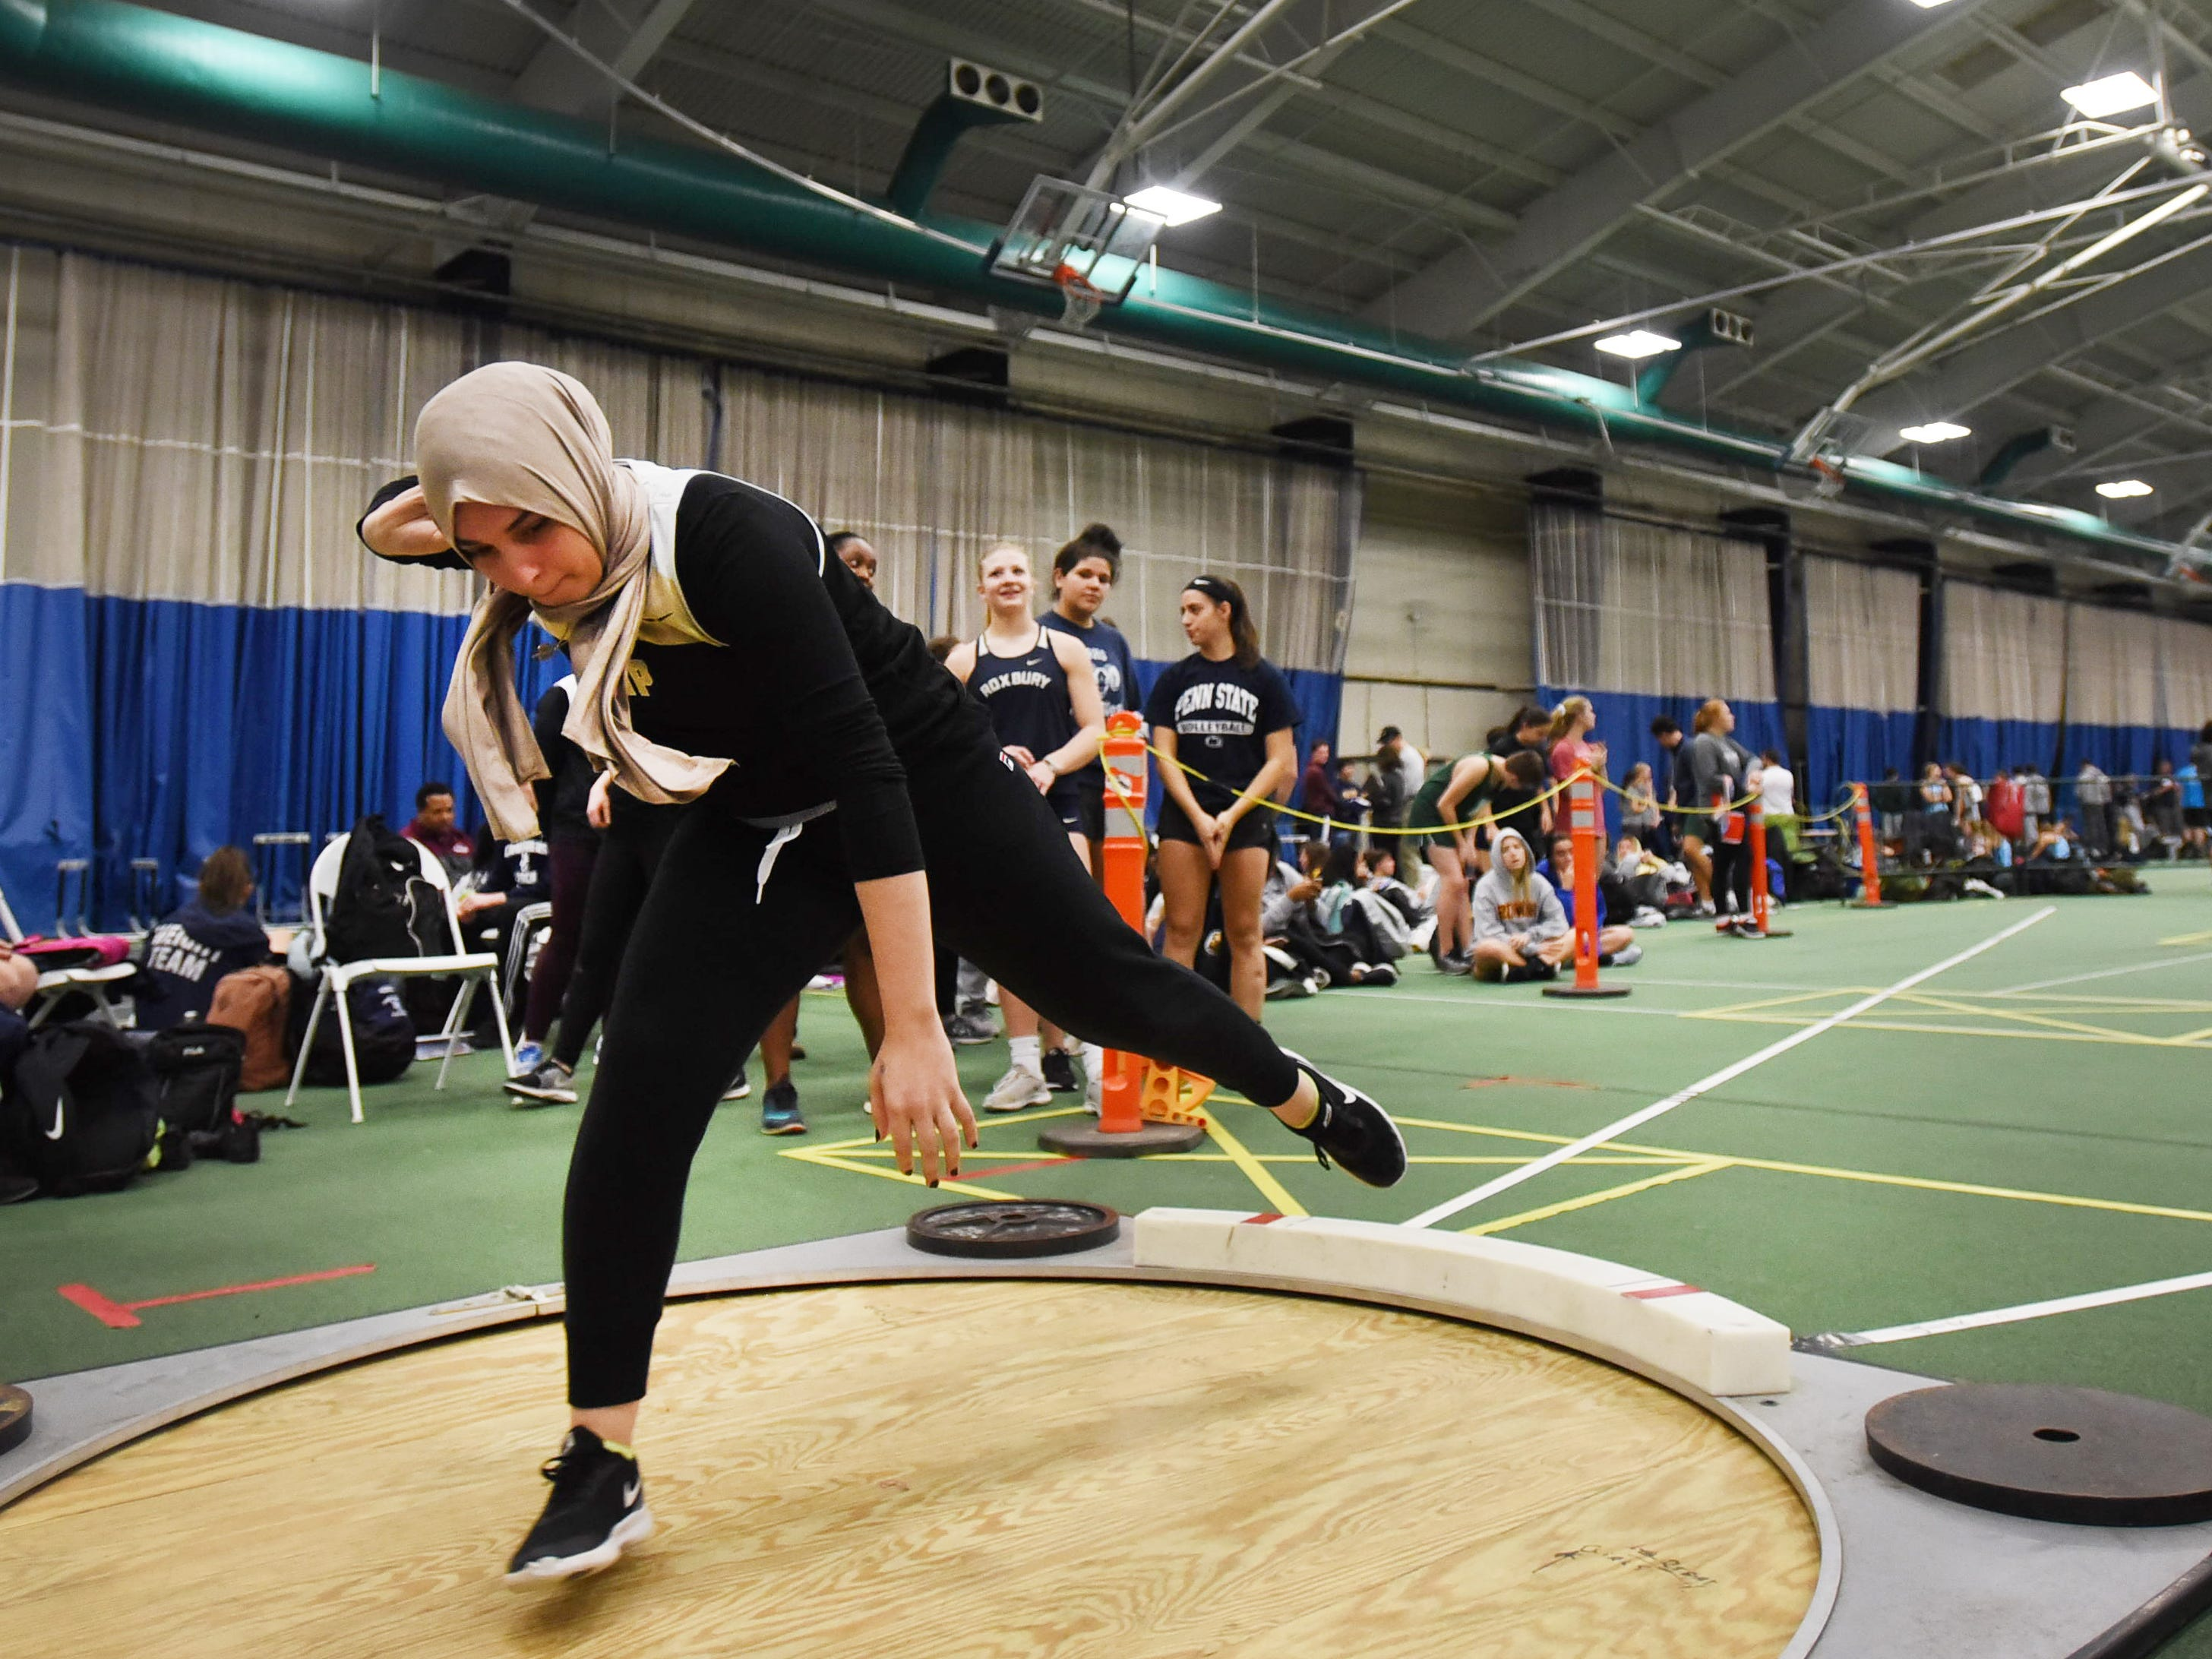 Hanover Park junior Rania Benatia competes in shot put at Morris County Relays at Drew University in Madison on 01/09/19.